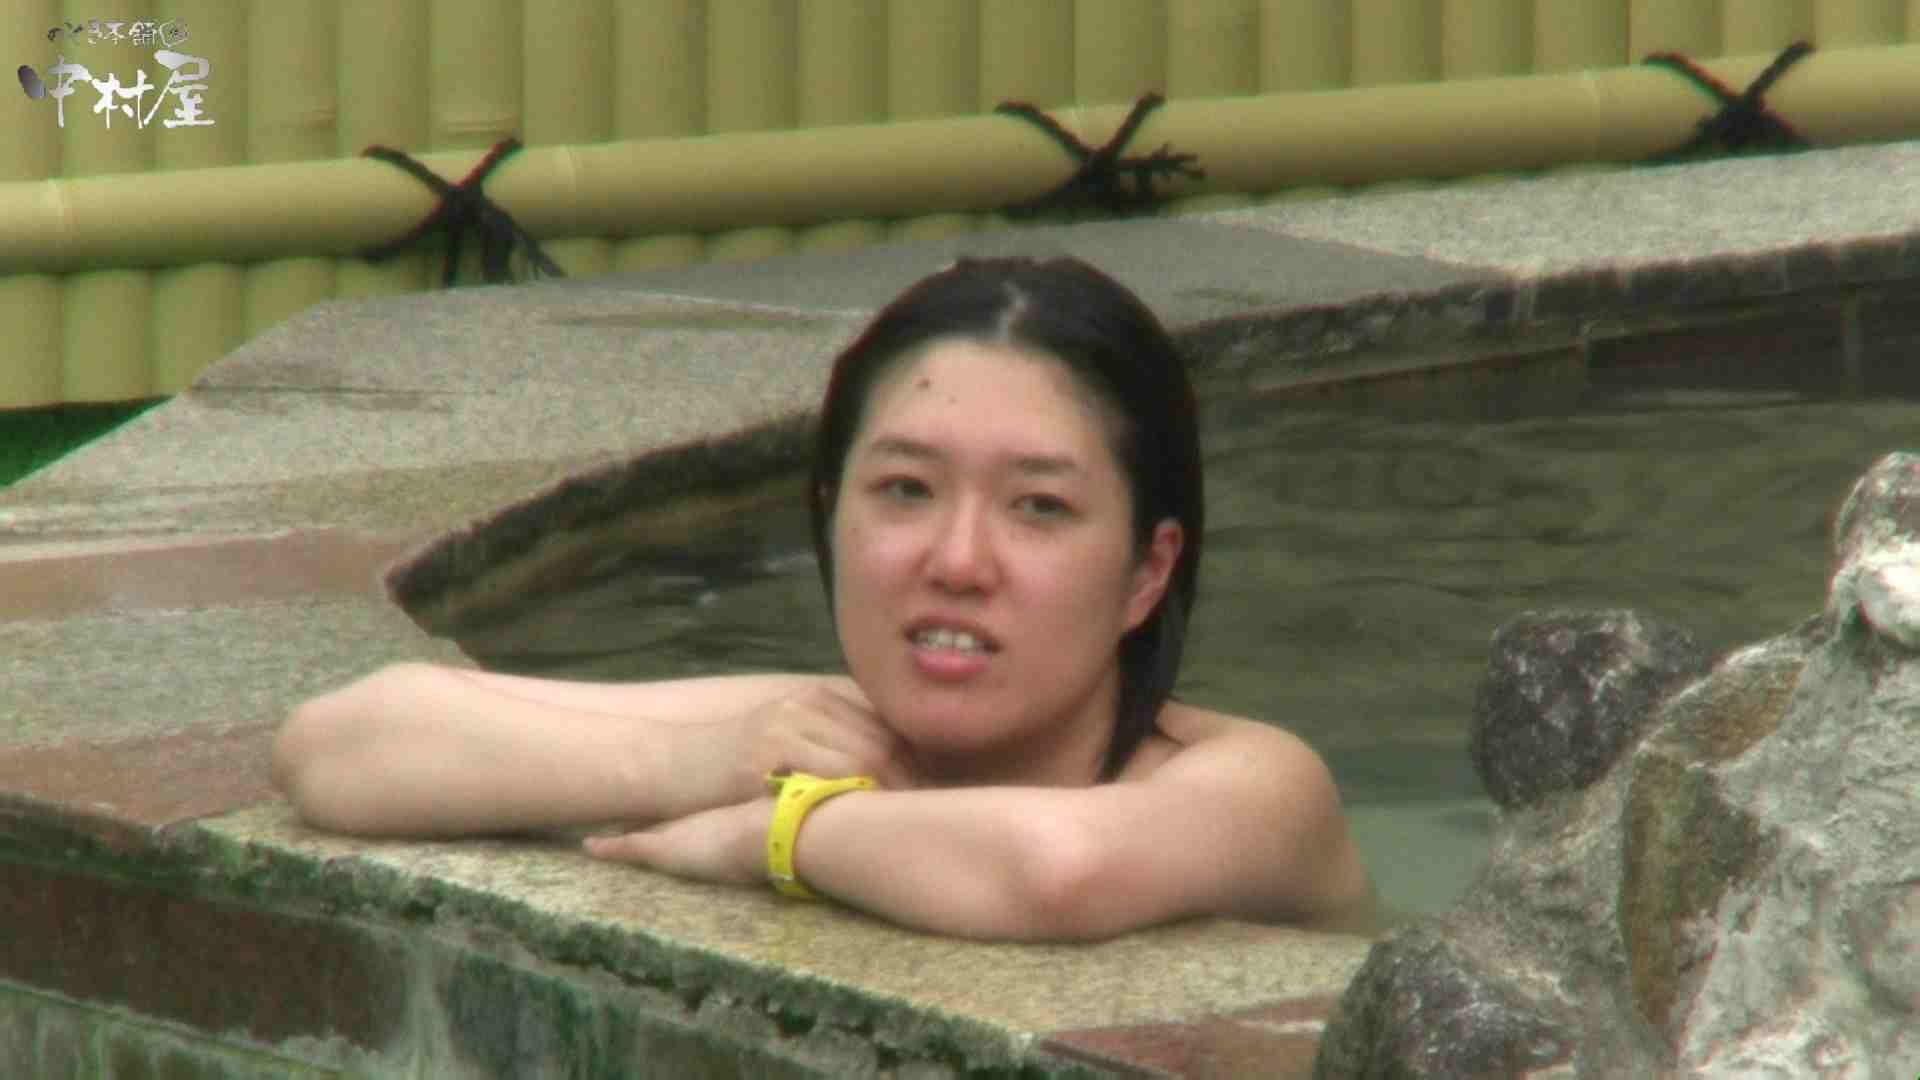 Aquaな露天風呂Vol.946 OLセックス  64画像 36